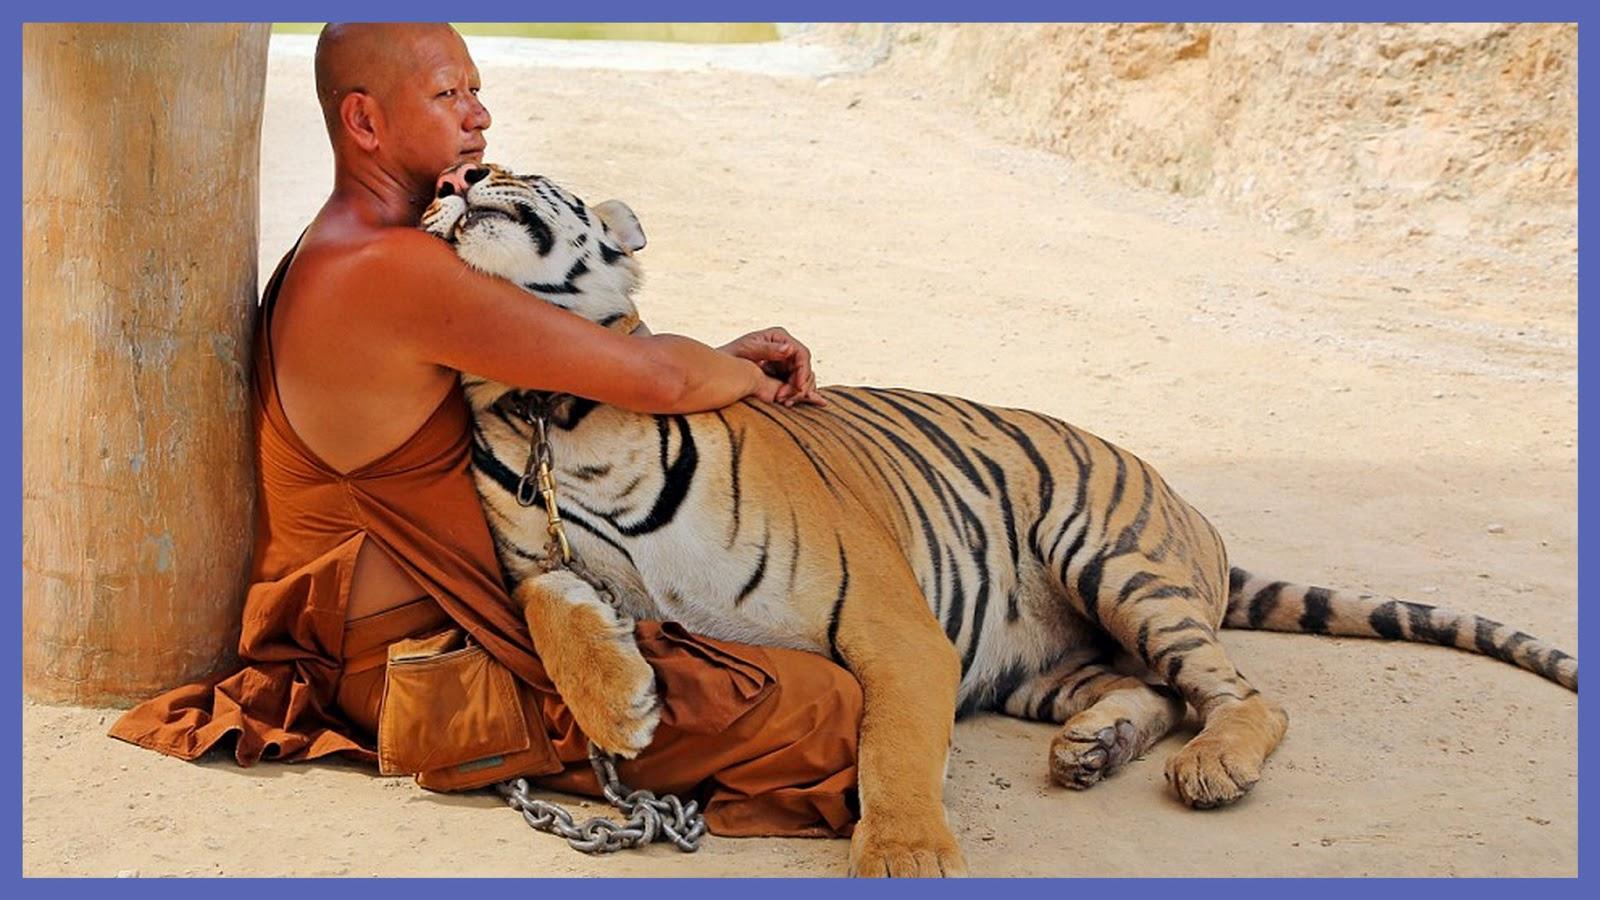 Buddhist Monks And The Tiger Temple Of Kanchanaburi